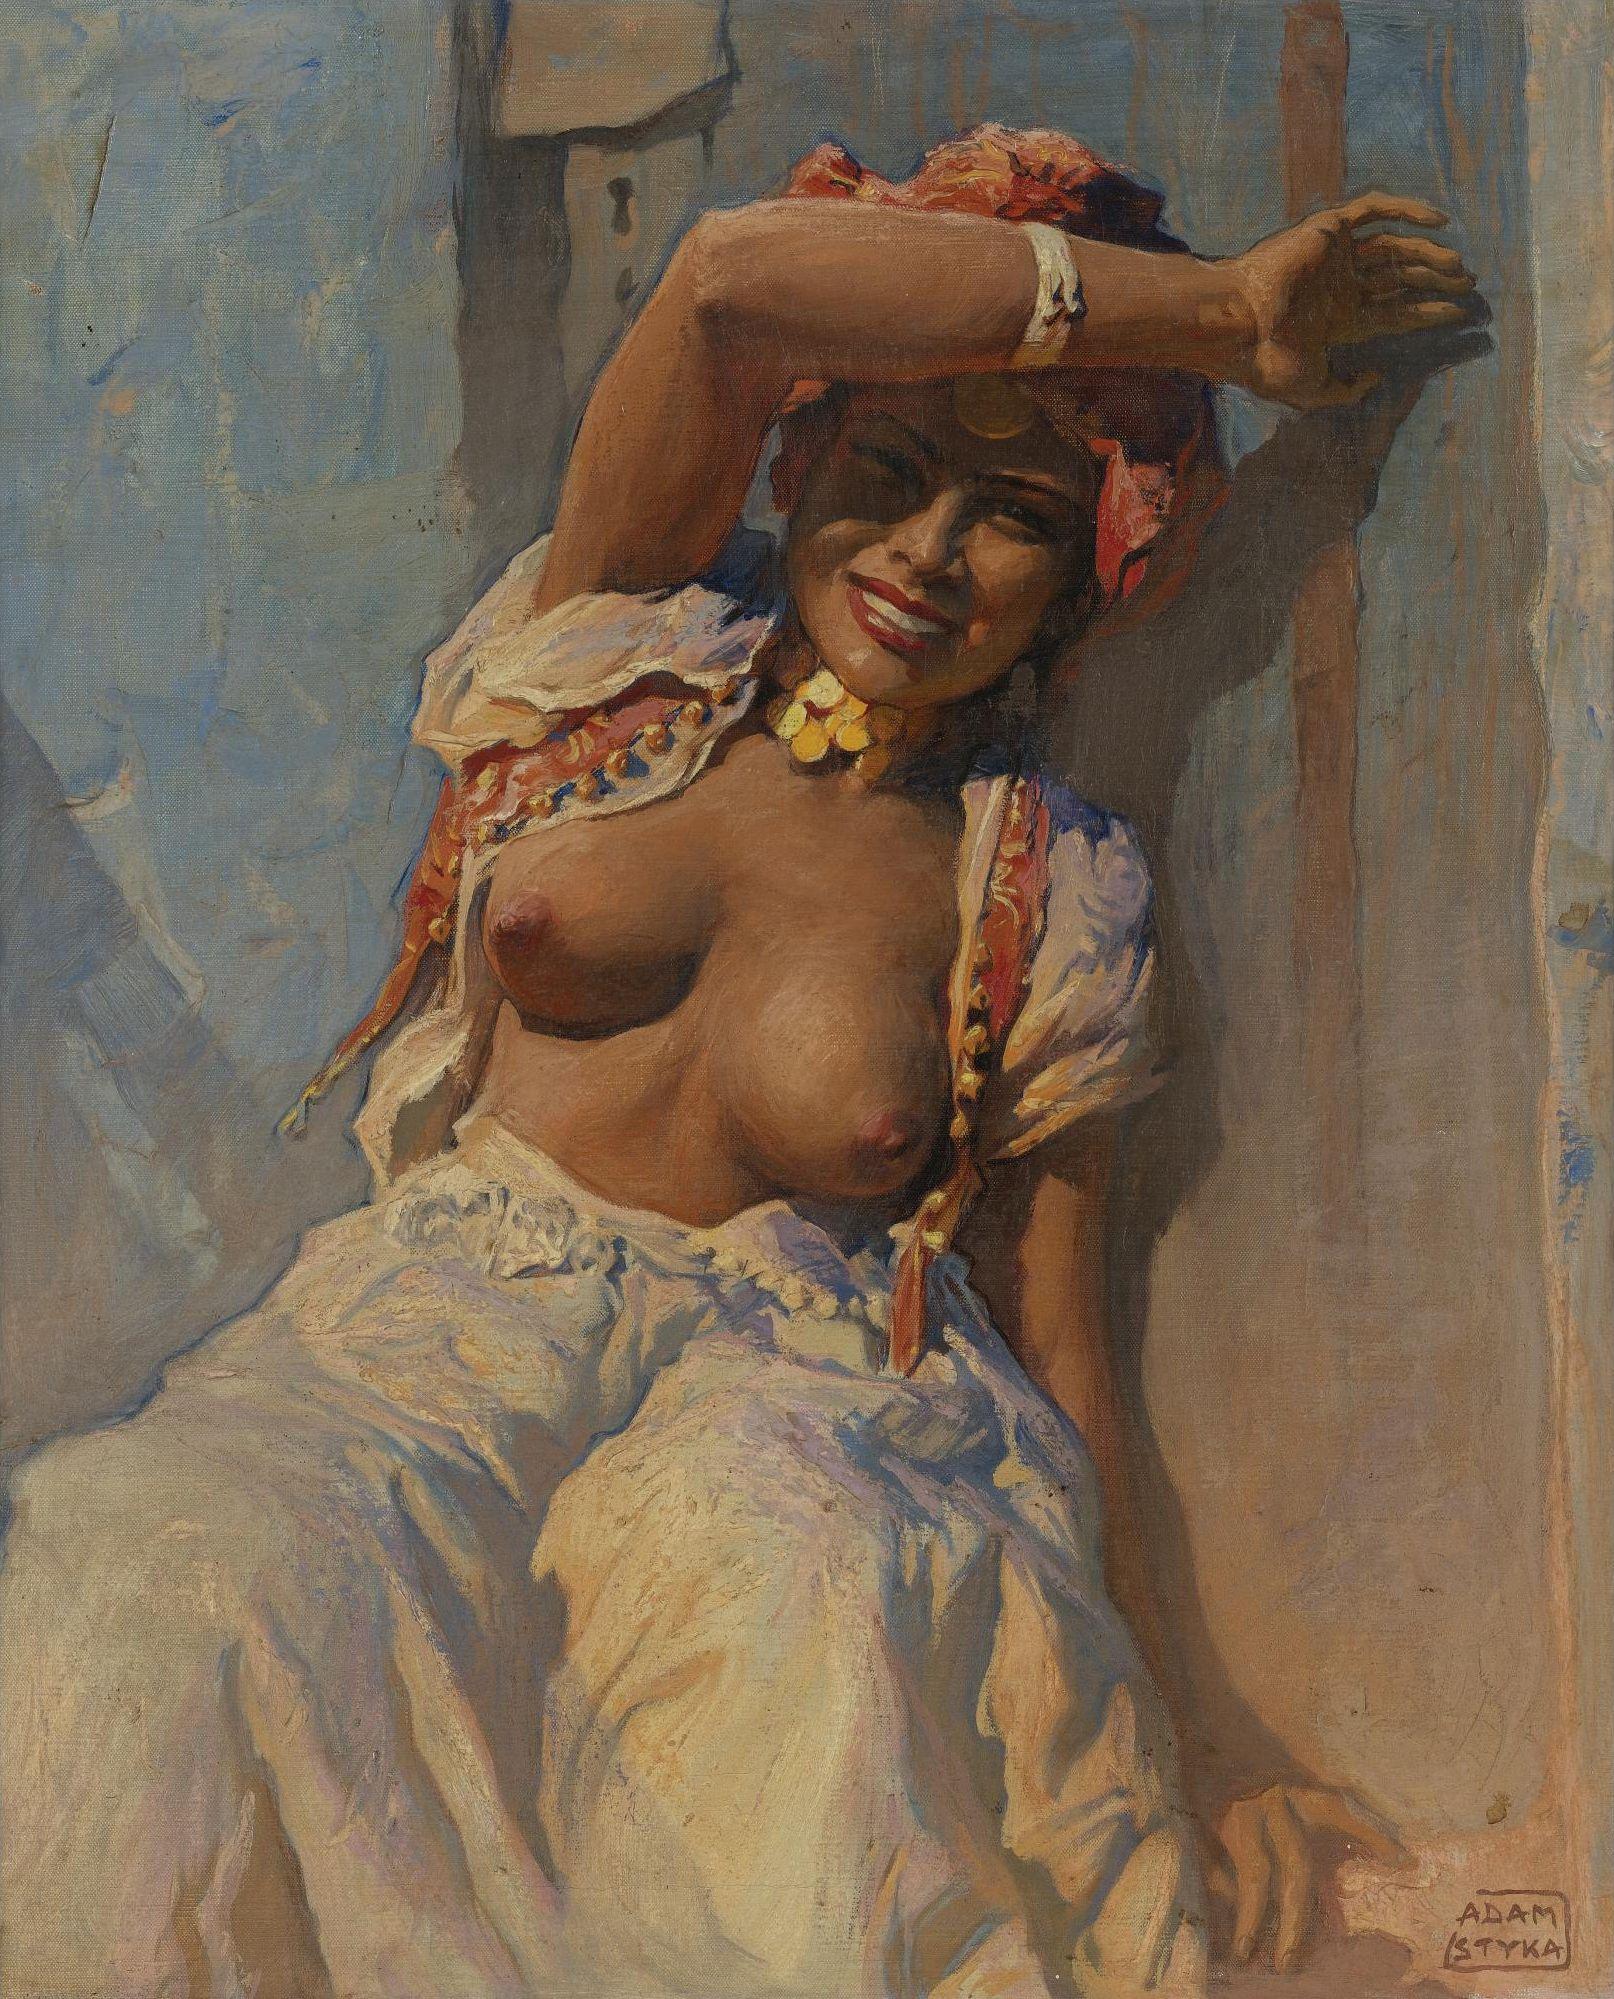 Adam Styka, 1890-1959. Марокканка Фатима у дверей. 61.2 х 51.1 см. Частная коллекция